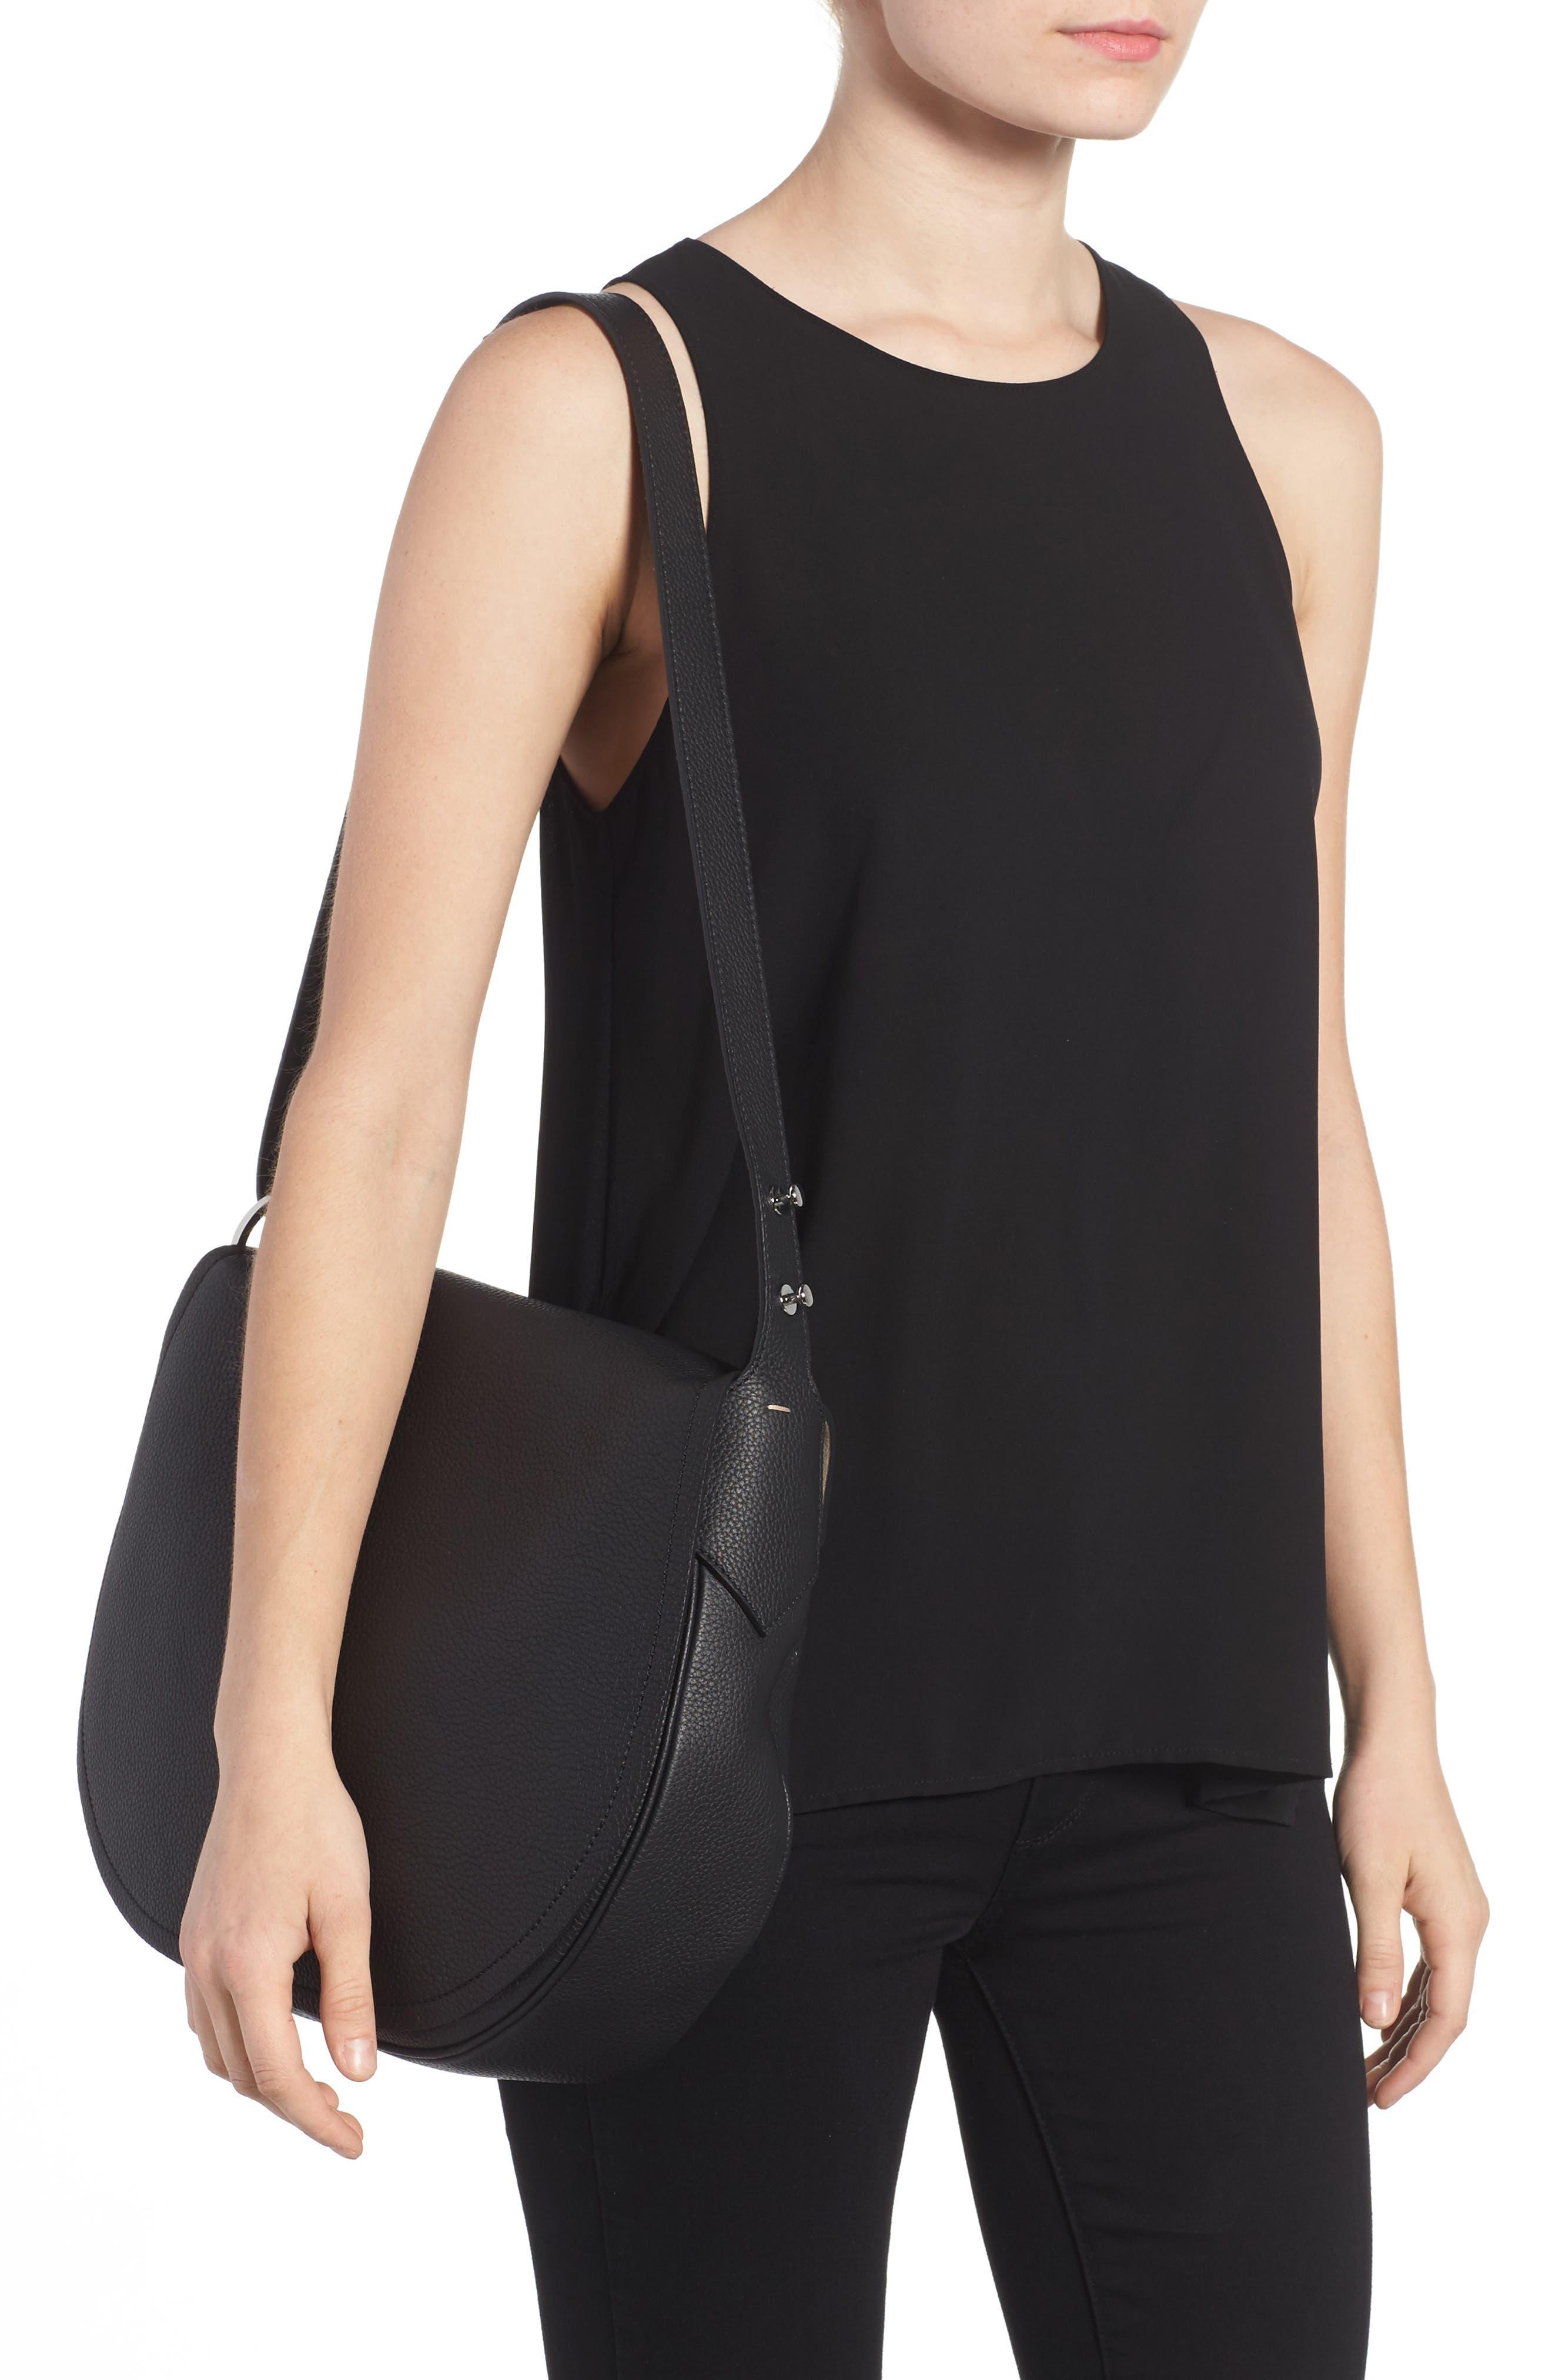 Valeria Cachemire Leather Saddle Bag,                             Alternate thumbnail 2, color,                             001